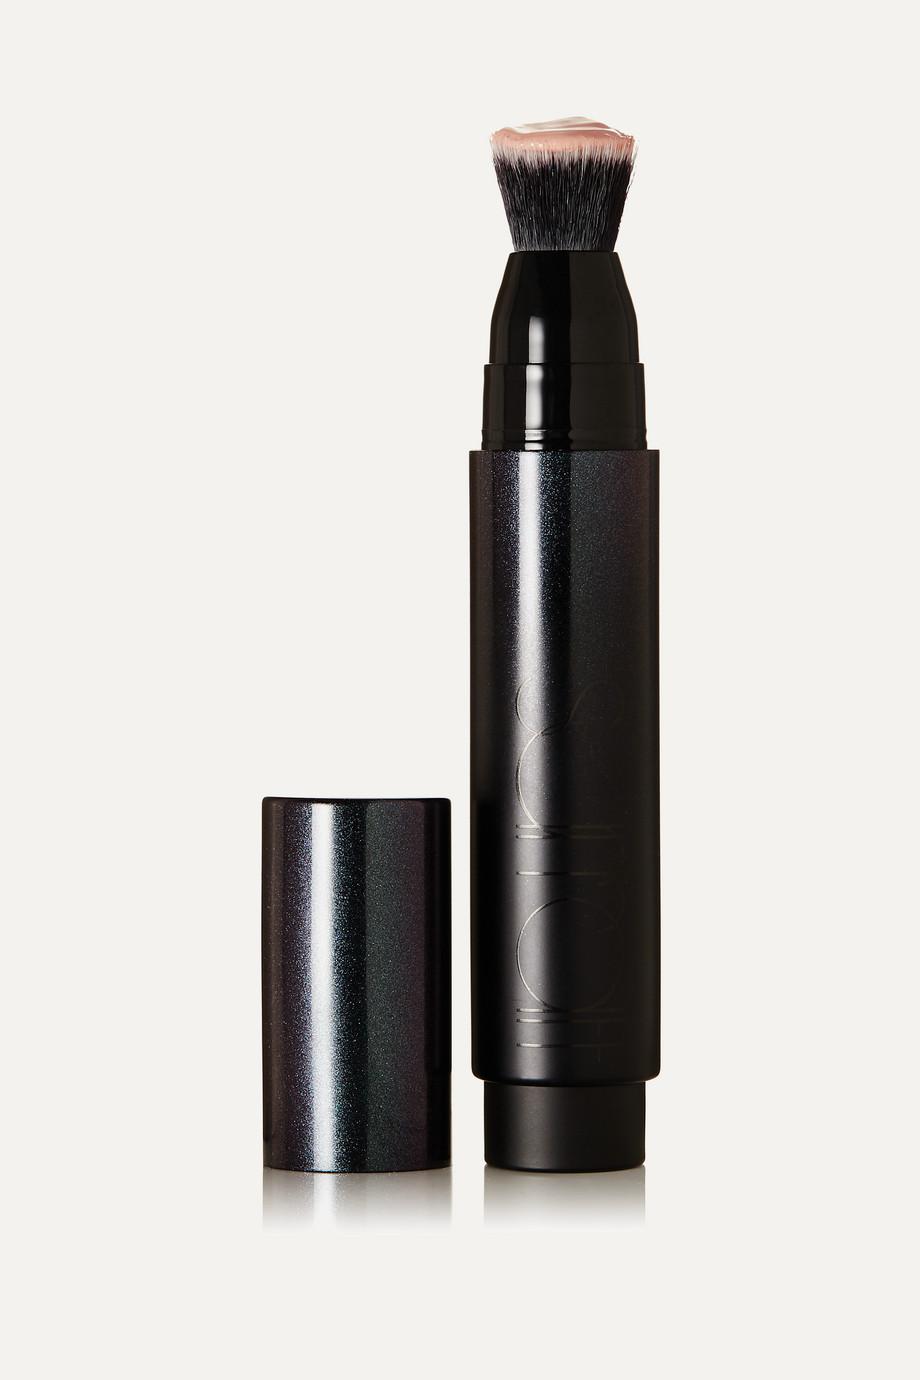 Surratt Beauty Surreal Skin Foundation Wand 6 – Foundation-Stick